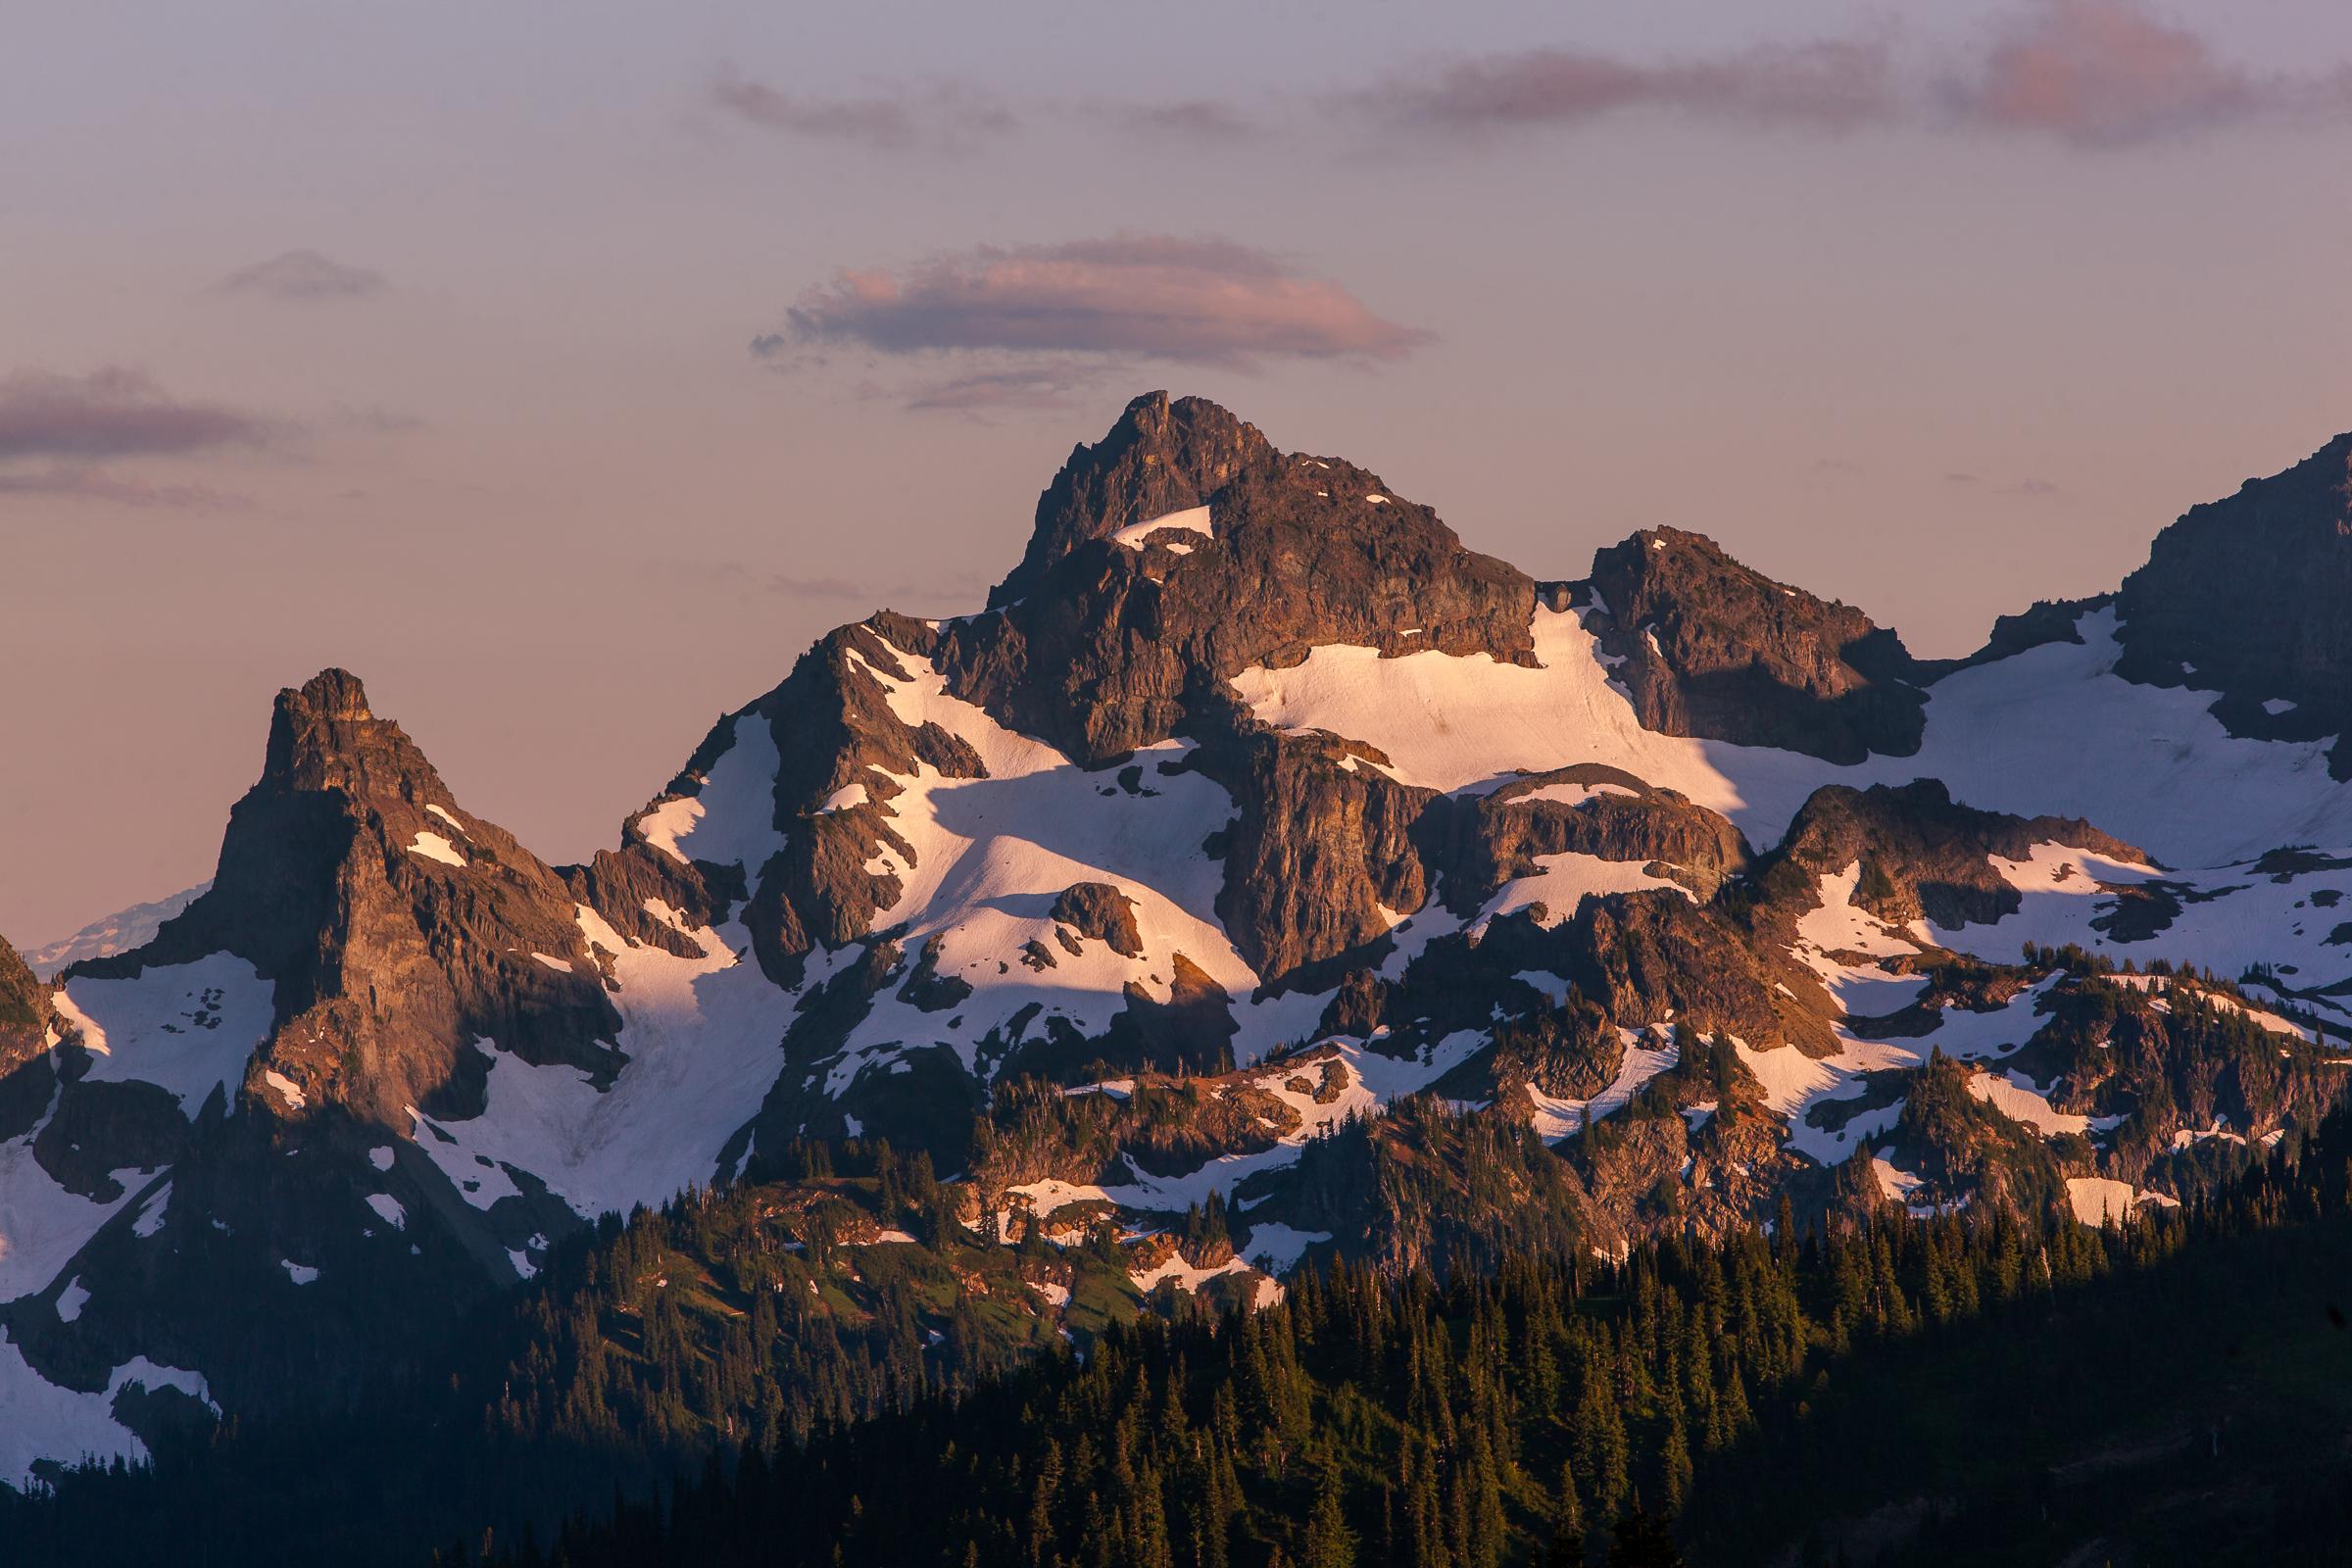 Last Light Along the Ridges